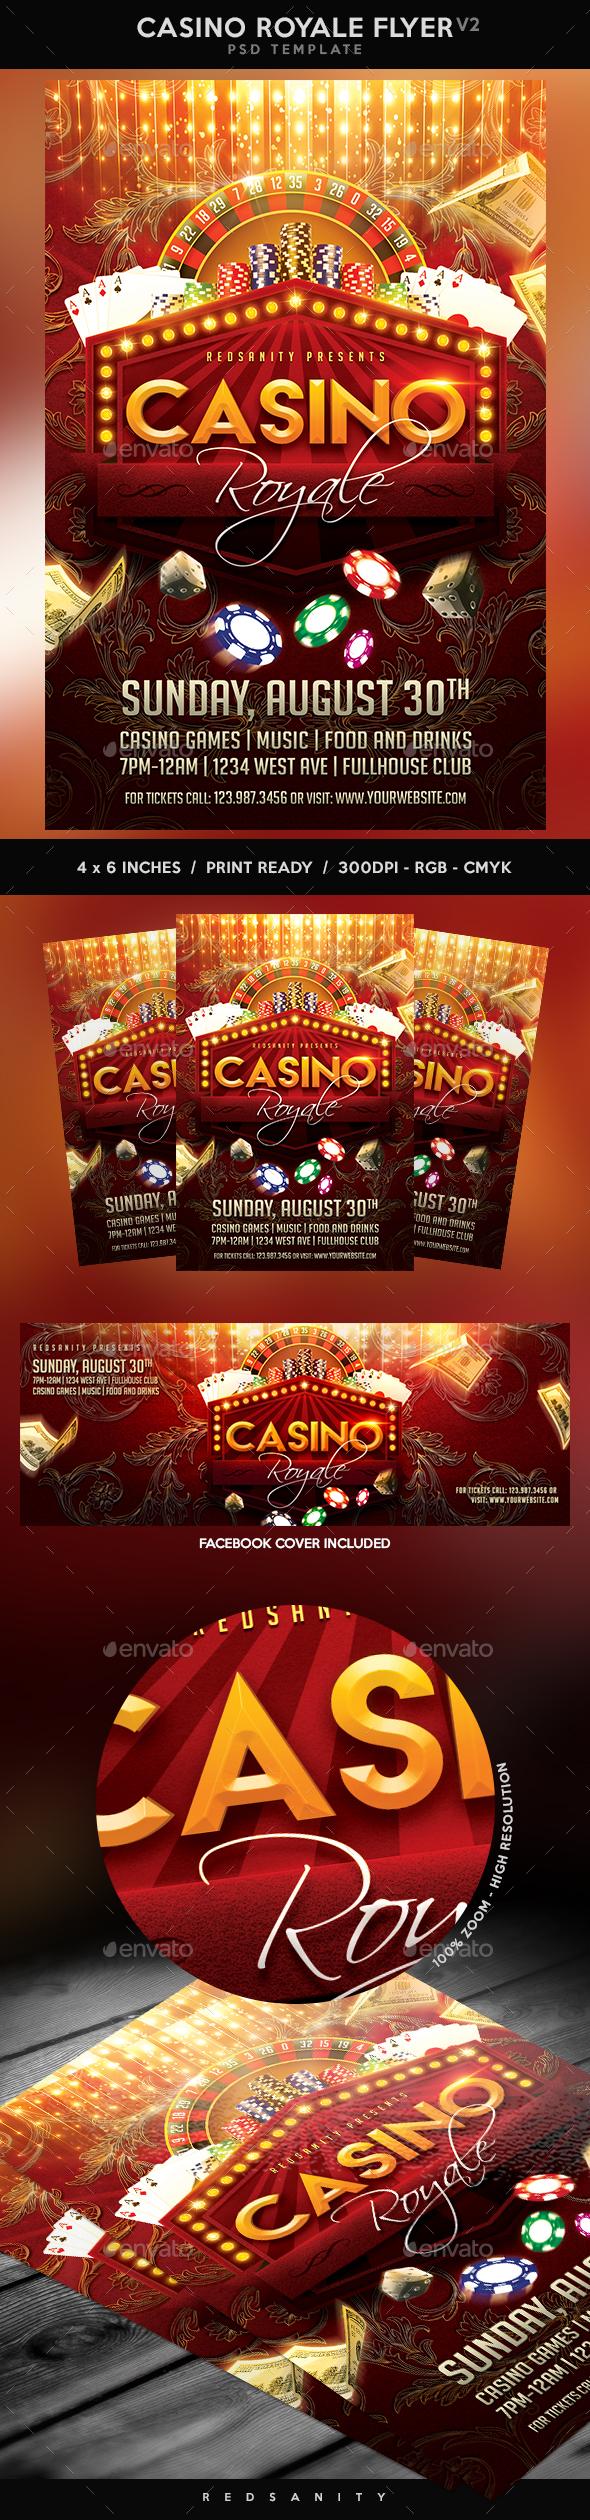 Casino Royale Flyer V2